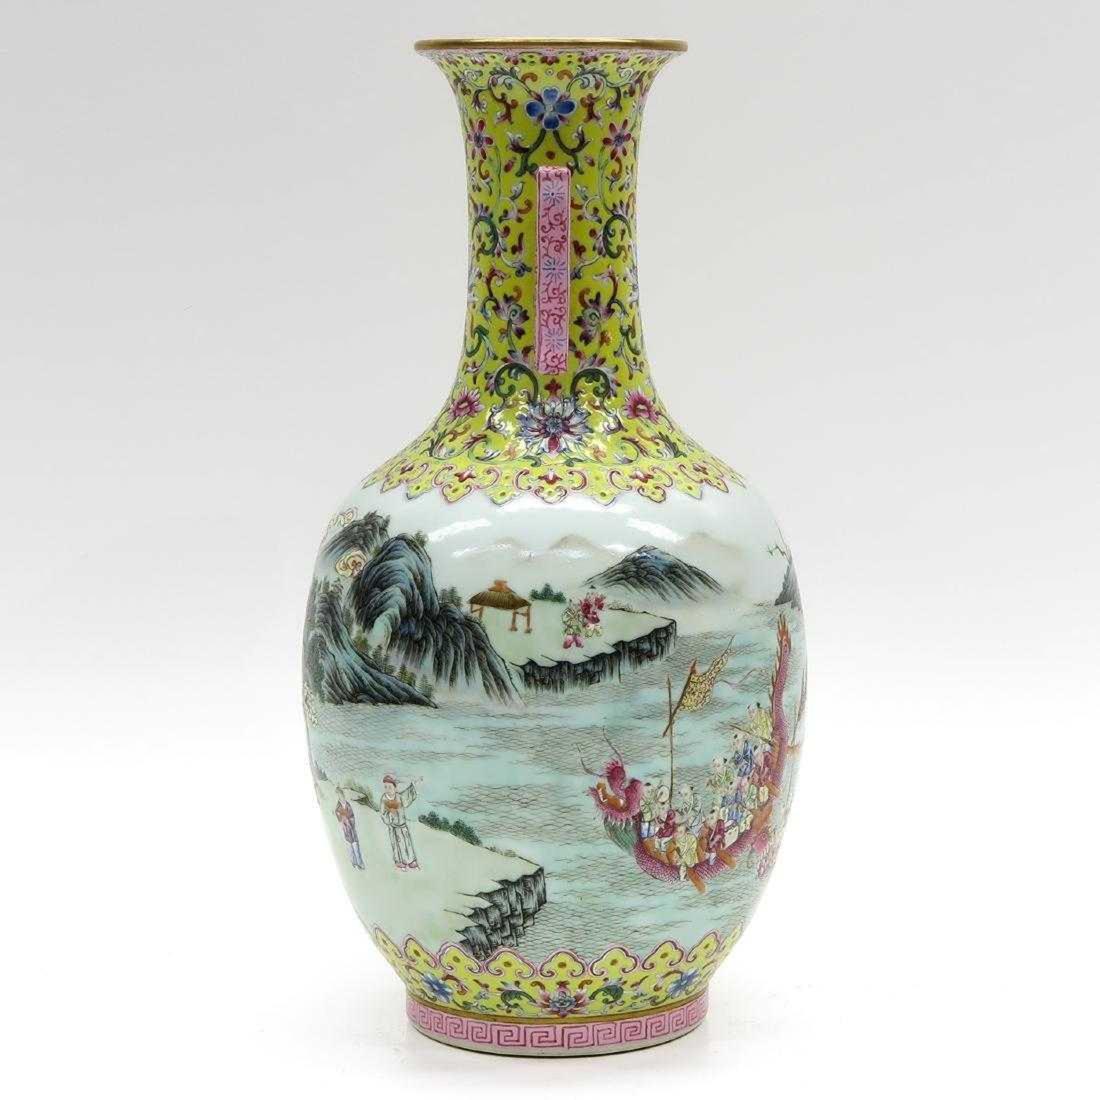 Chinese Famille Rose Enamel Decor Vase - 4